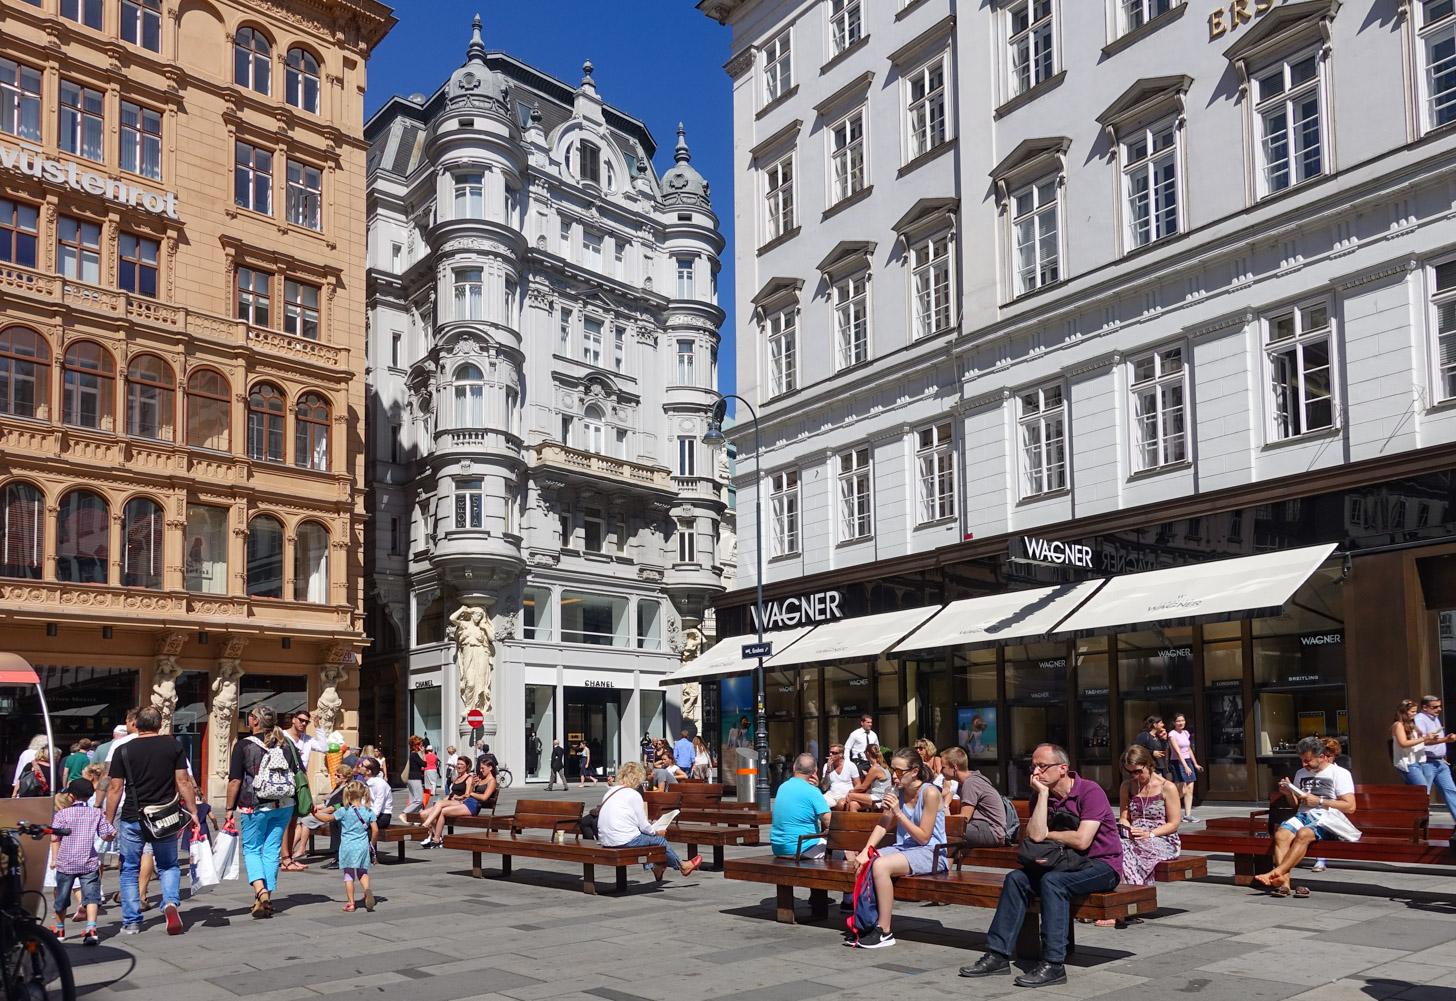 stedentrip naar Wenen